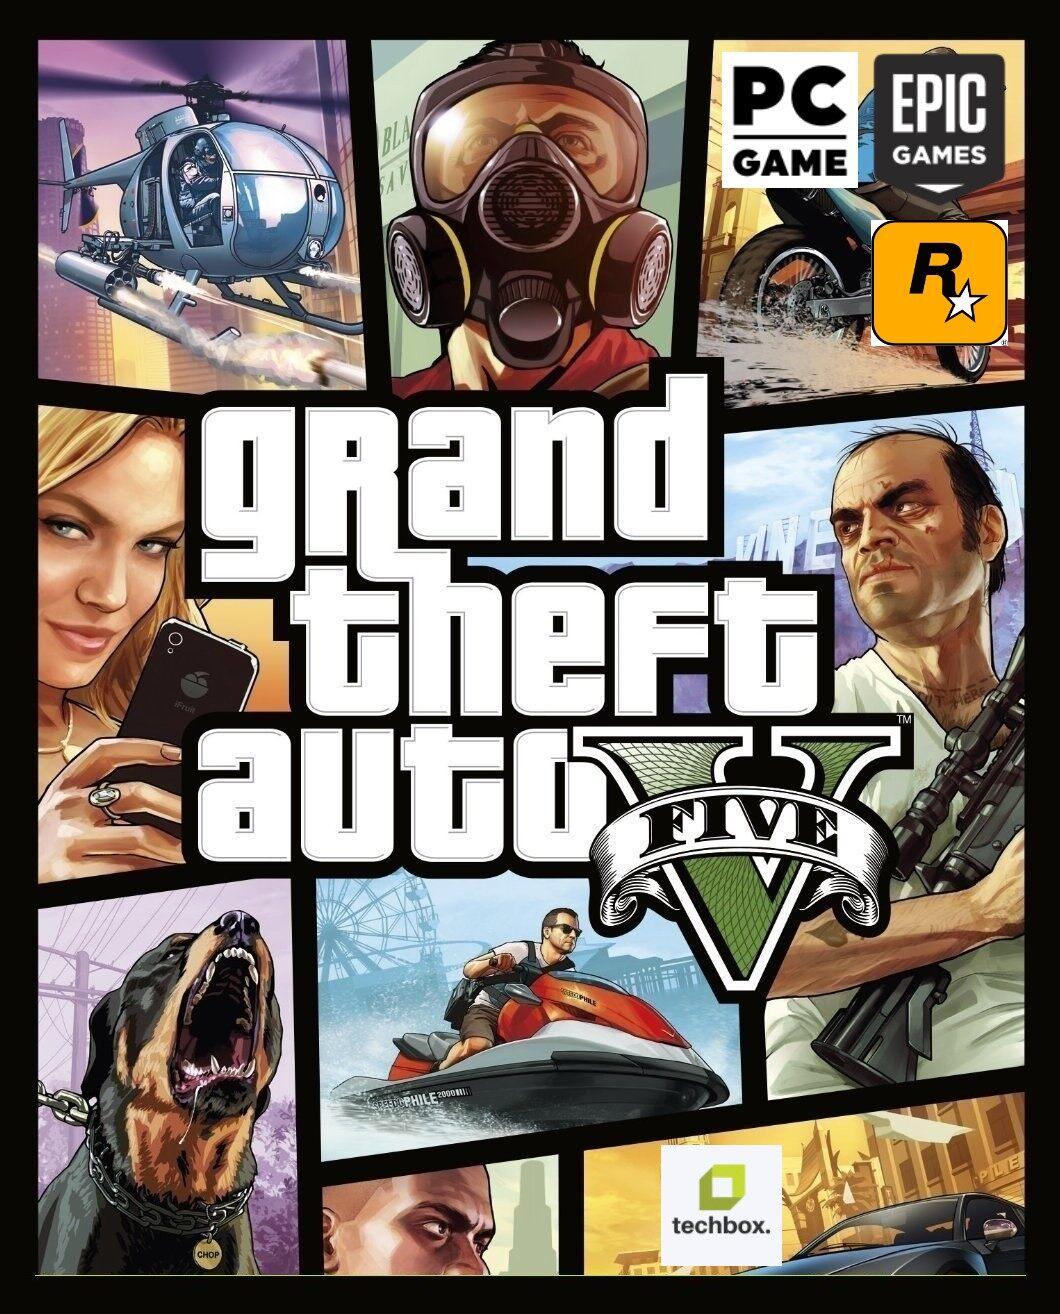 Gta V Premium Edition (gta 5) ลิขสิทธิ์แท้ เล่น Fime M ได้ - Gta V Steam, Epicgames, Rockstar Key - Gta V แท้ ราคาถูก - Gta V Pc - Gta V ไฟm ได้ - รหัส Gta V - คีย์ Gta V.